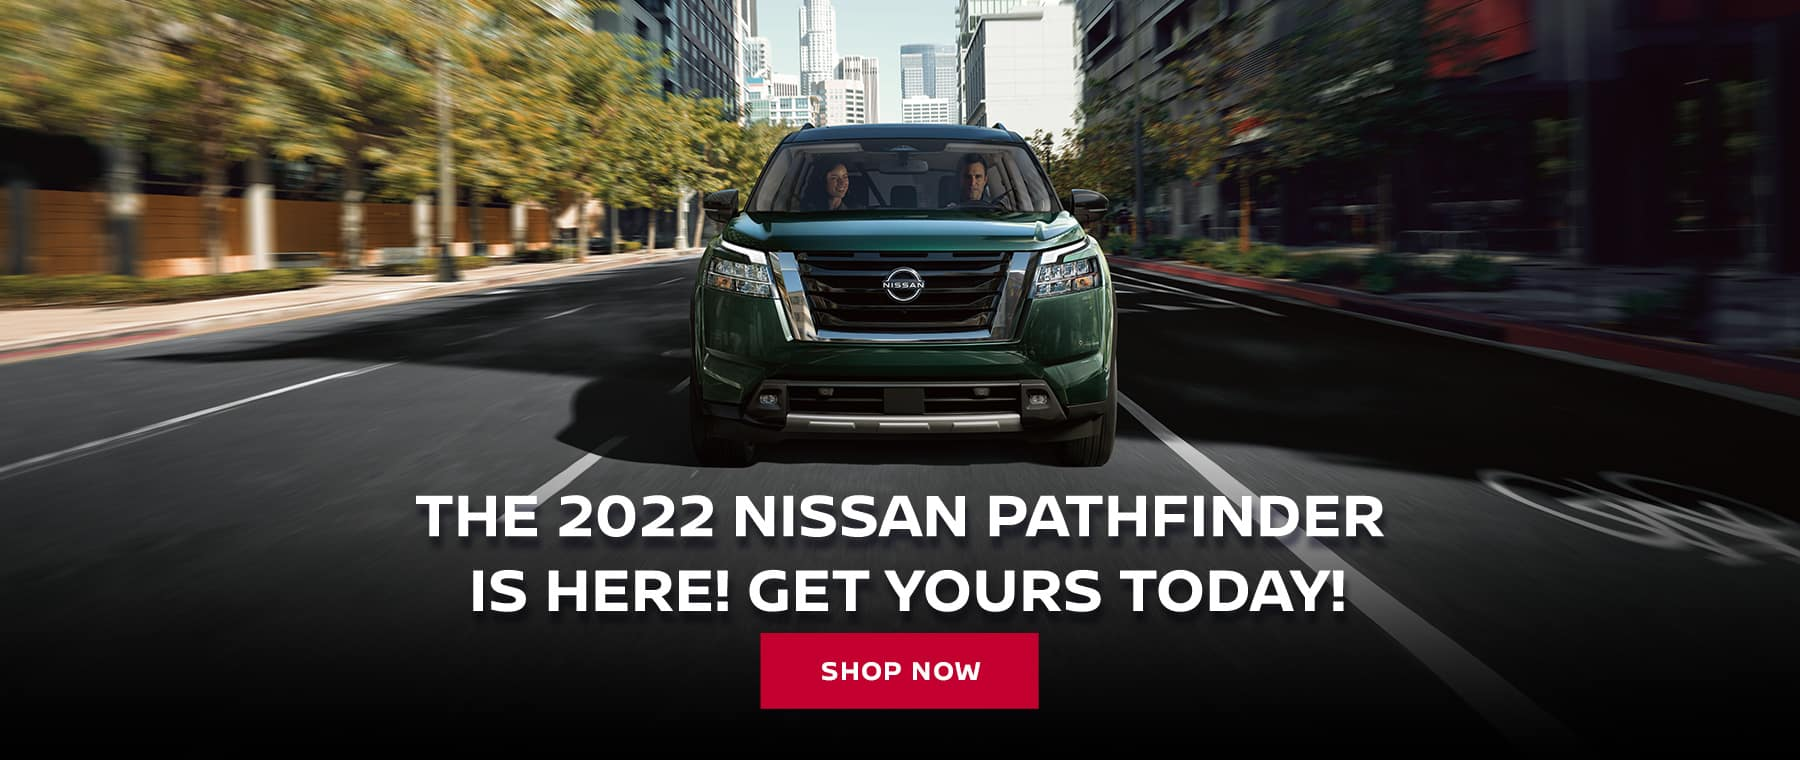 2022-pathfinder-july-21